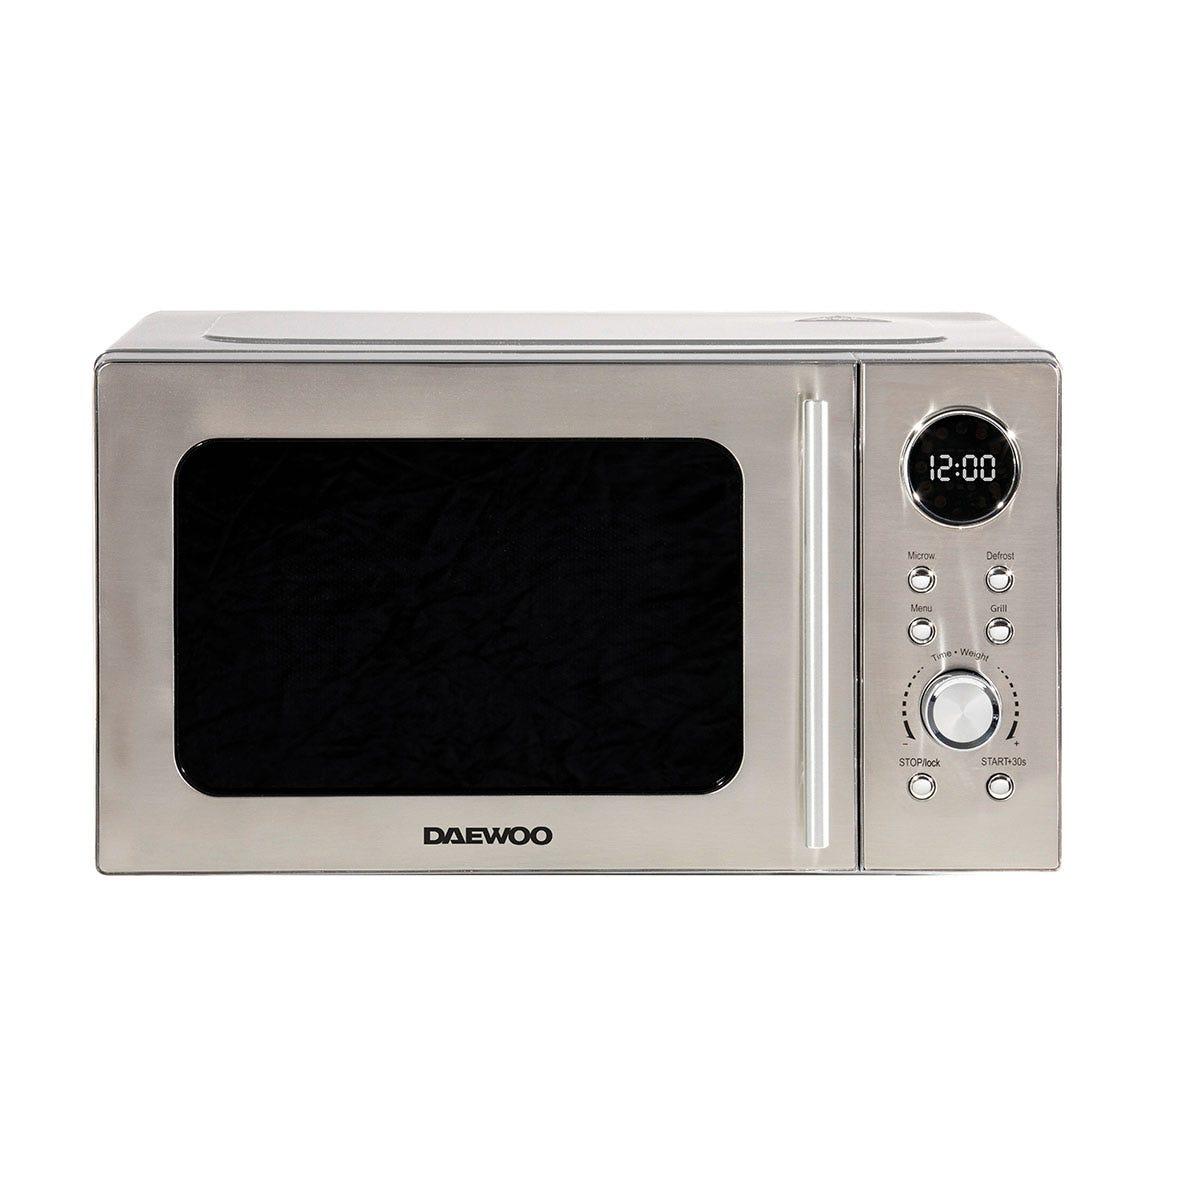 Daewoo SDA2090GE 20L 700W Microwave - Silver